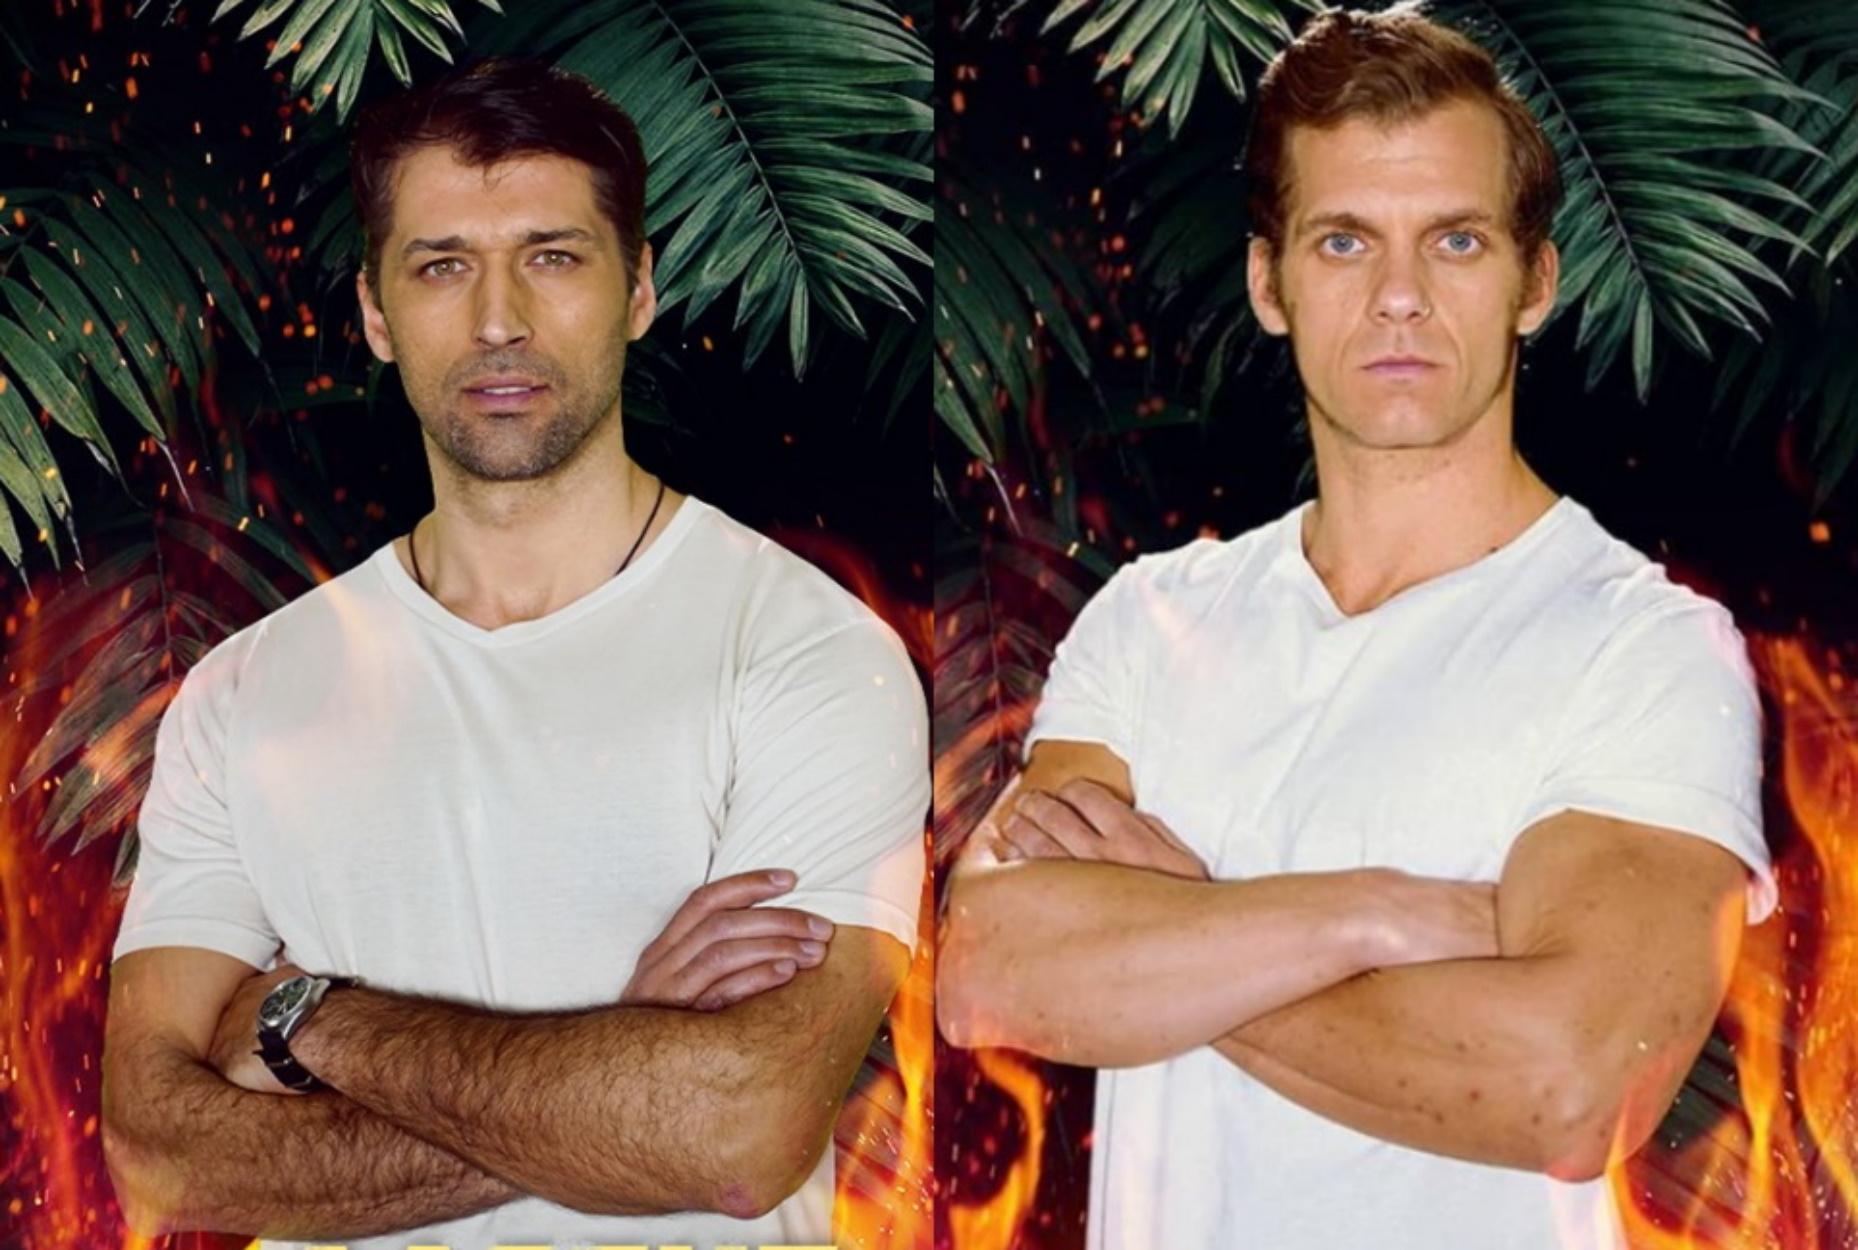 Survivor: Γιατί «χάθηκαν» στη ζούγκλα για ώρες, Αλέξης Παππάς και Κρις Σταμούλης